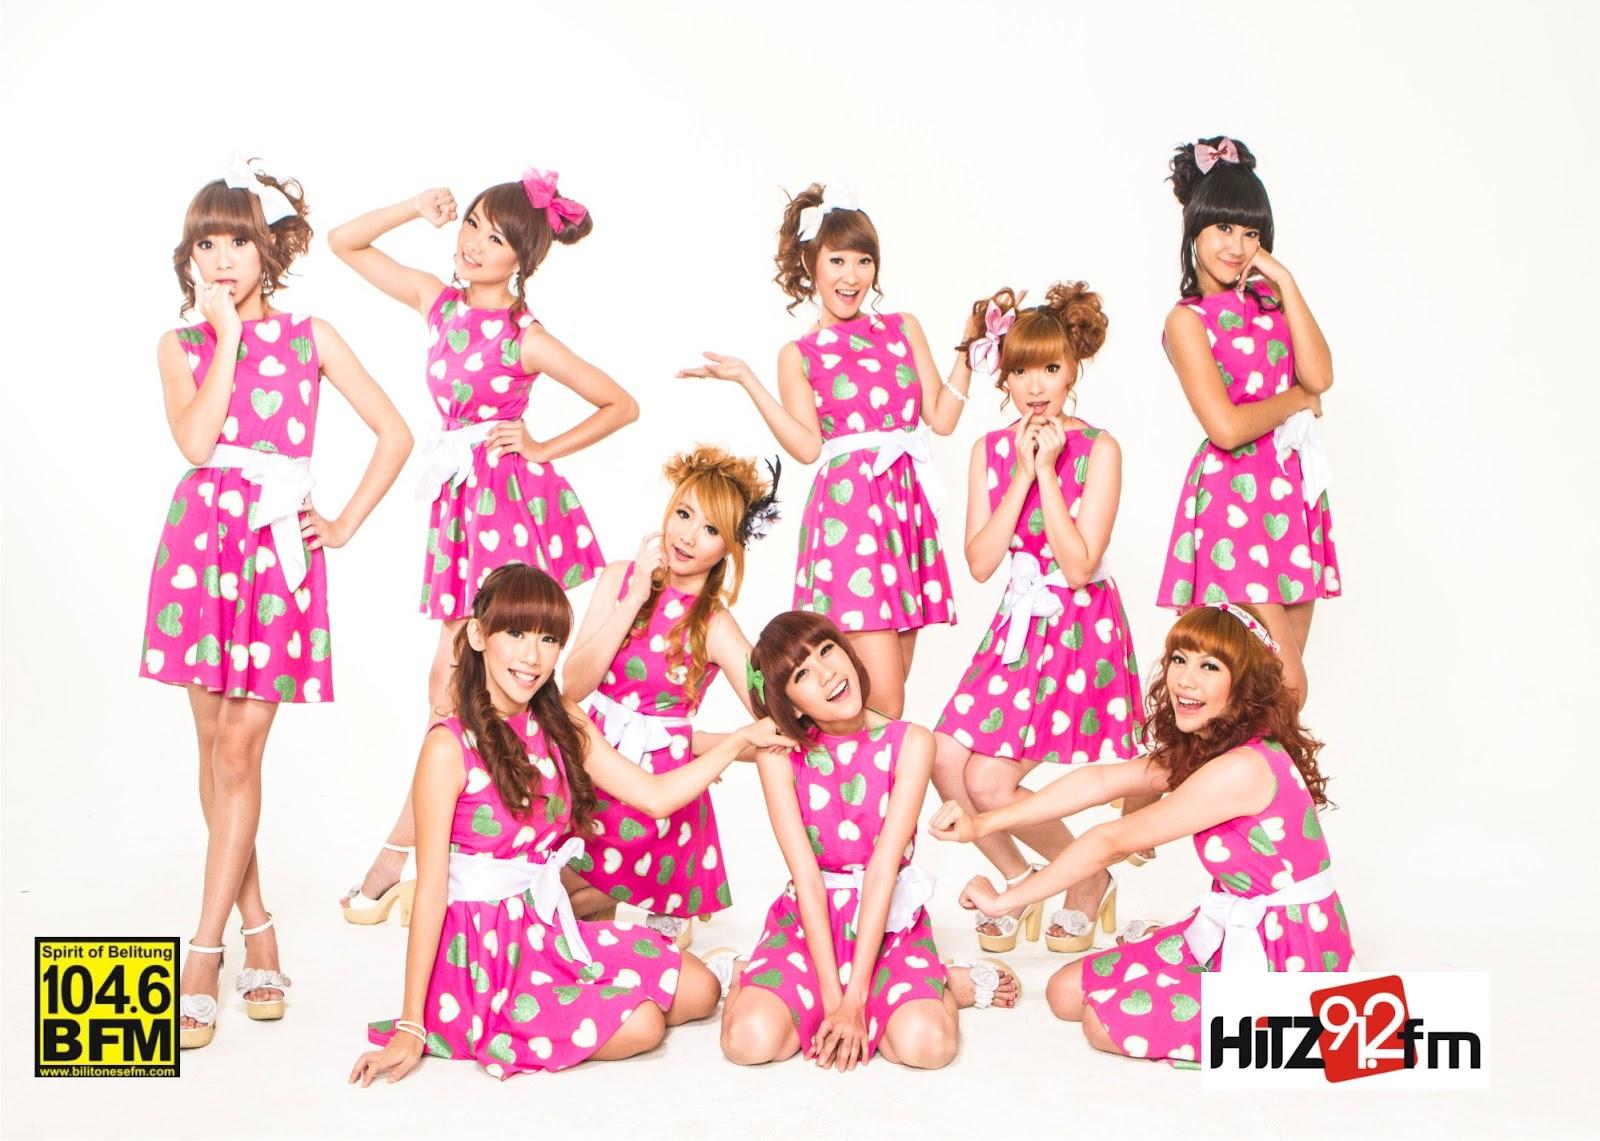 Foto Dan Wallpaper Cherrybelle Girlband Indonesia BloKuFo